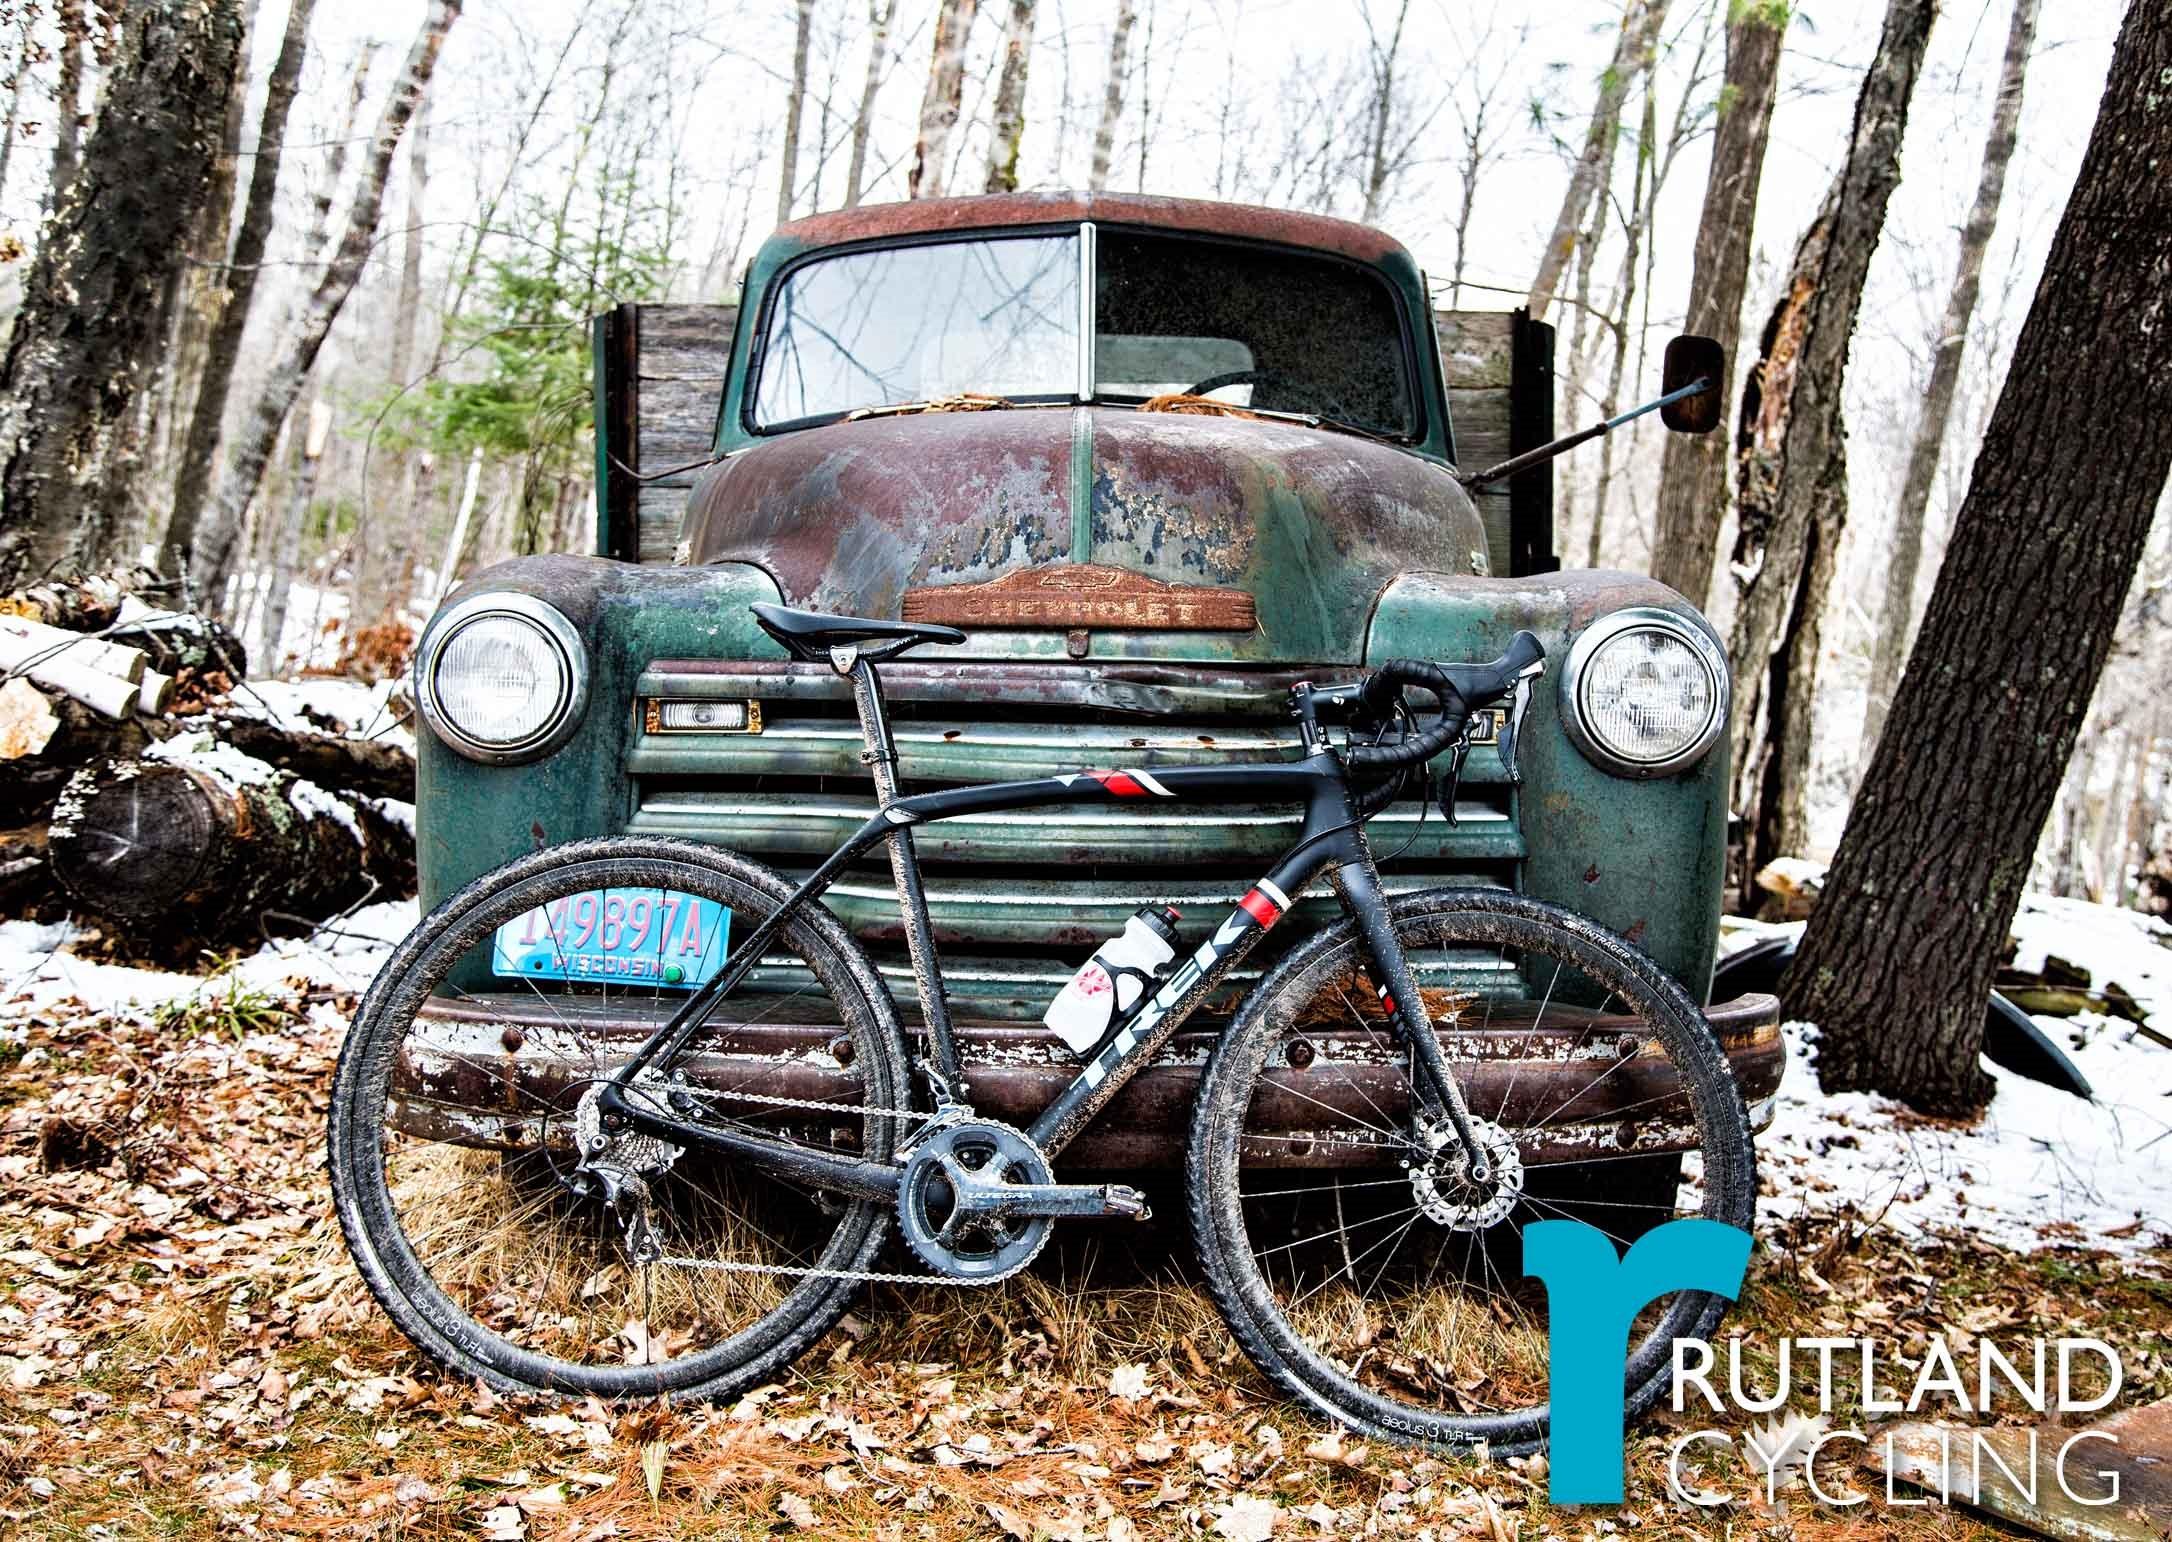 Rutland Cycling Scrappage Scheme